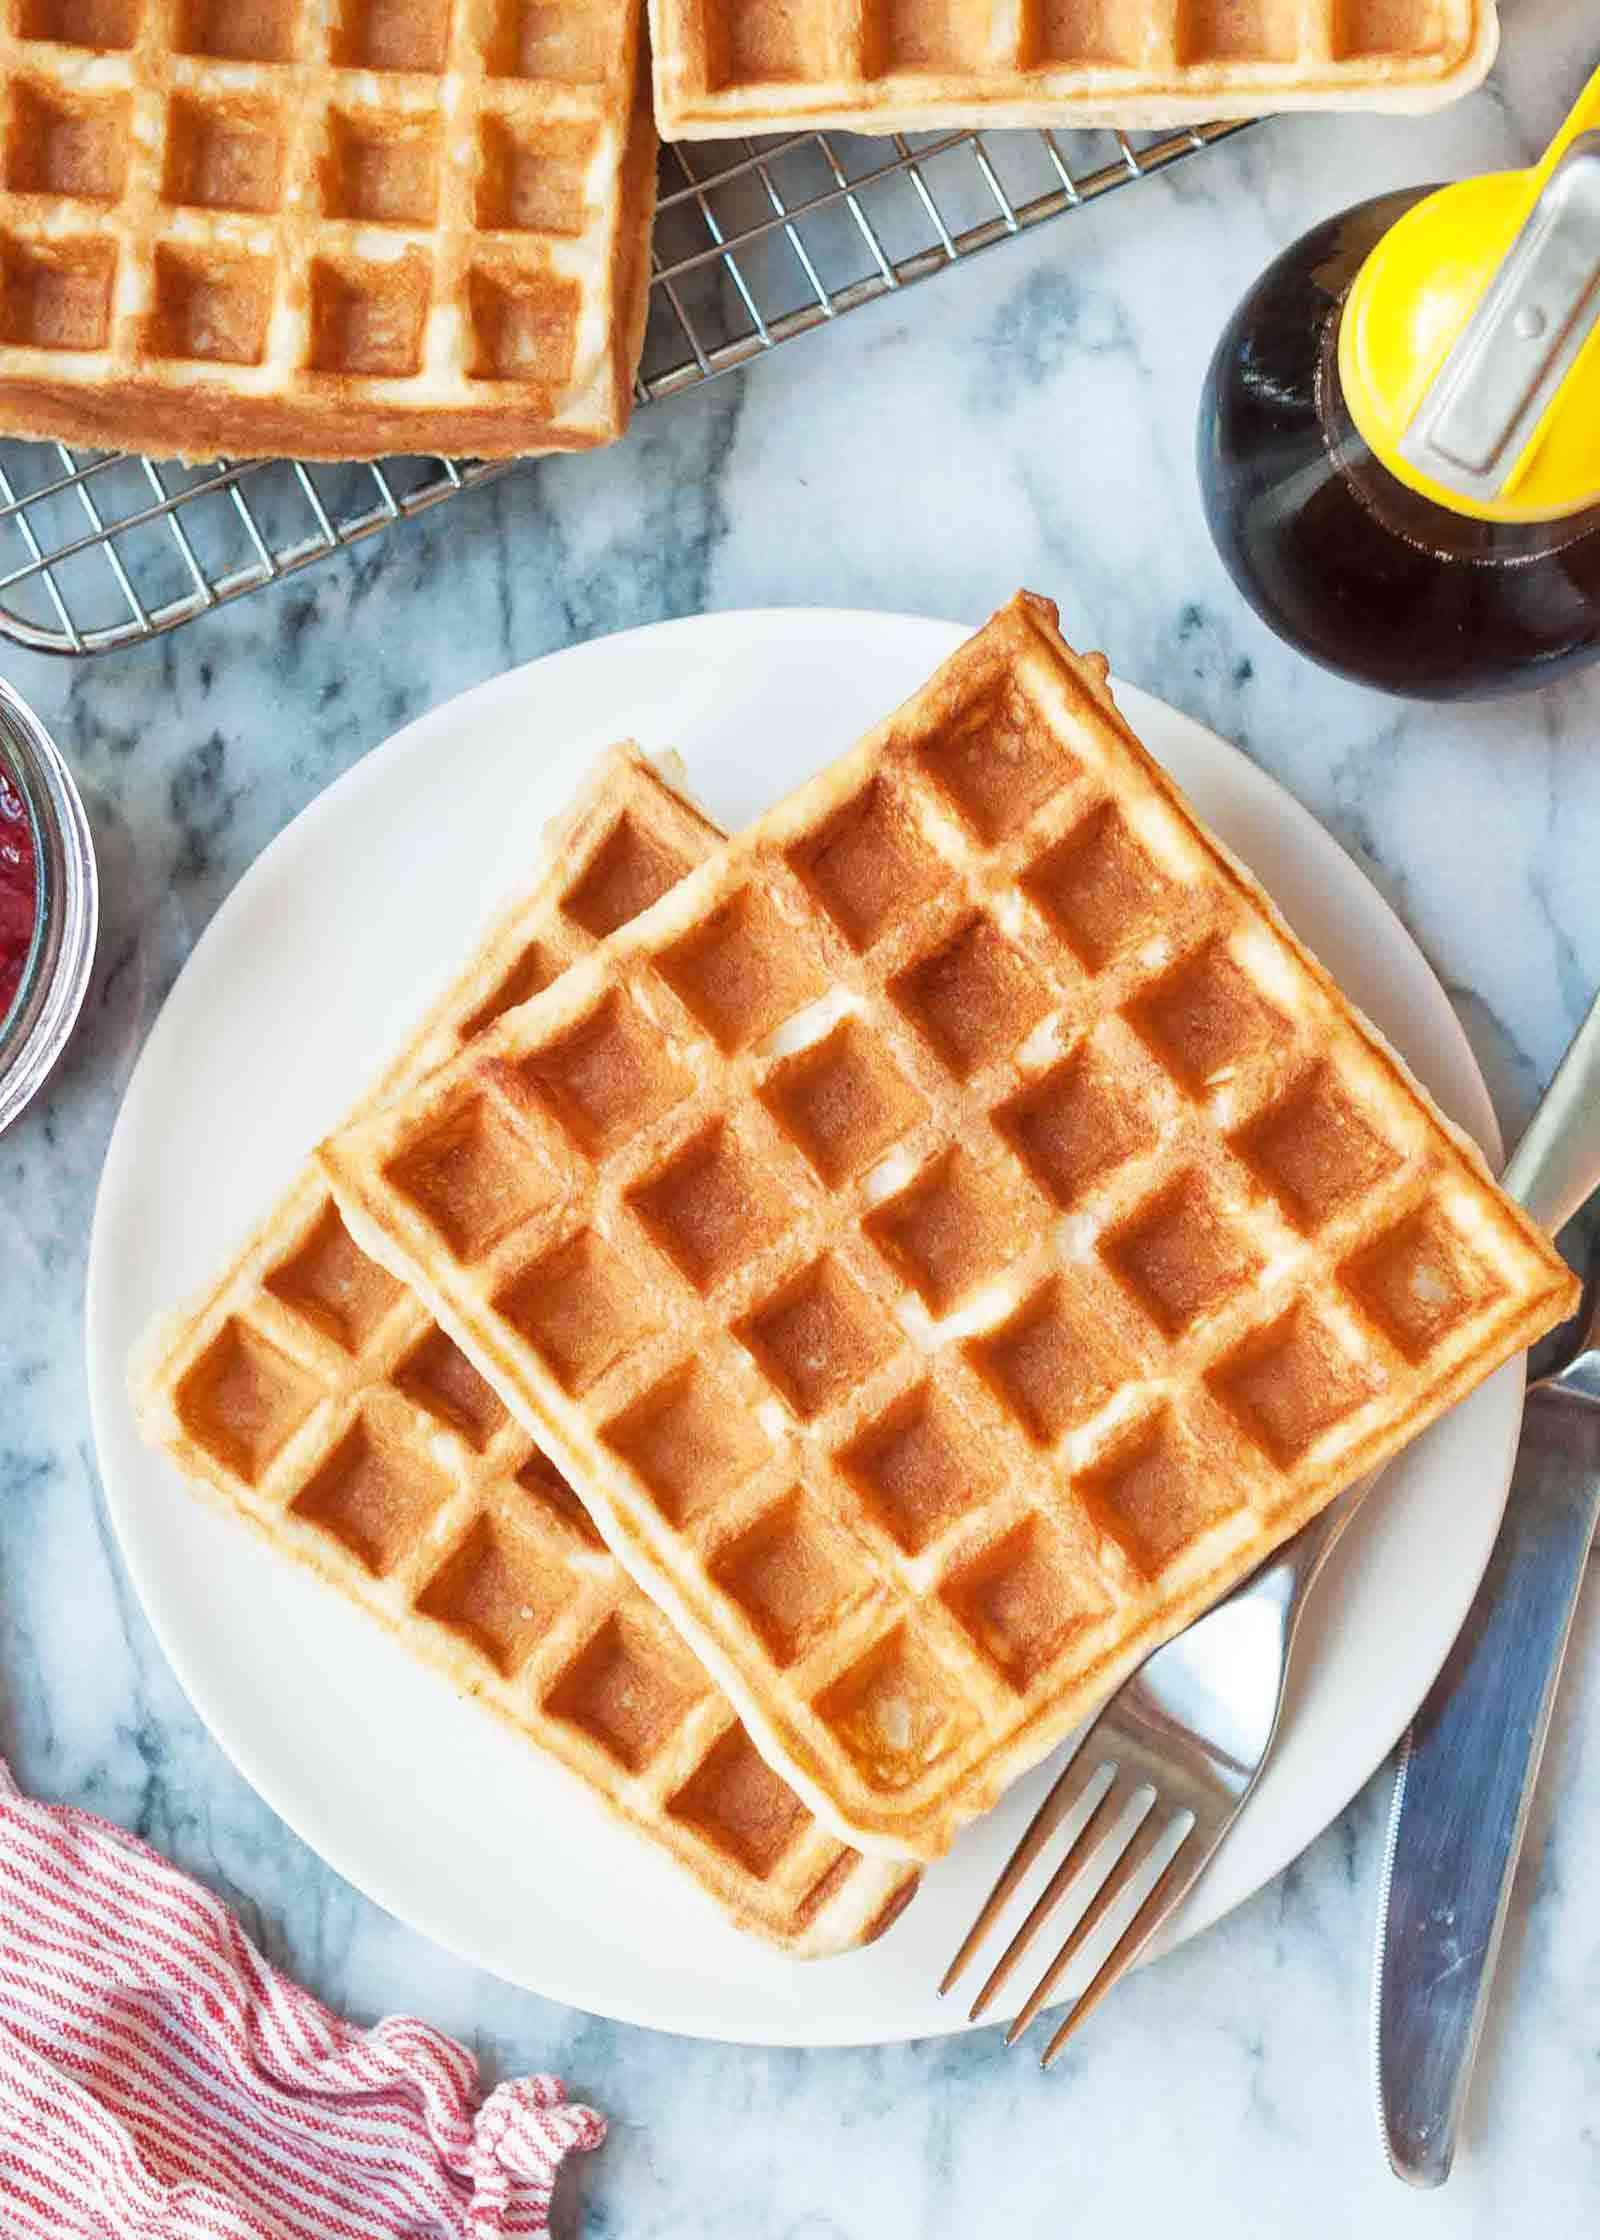 Buttermilk Waffle Recipe that makes crispy waffles